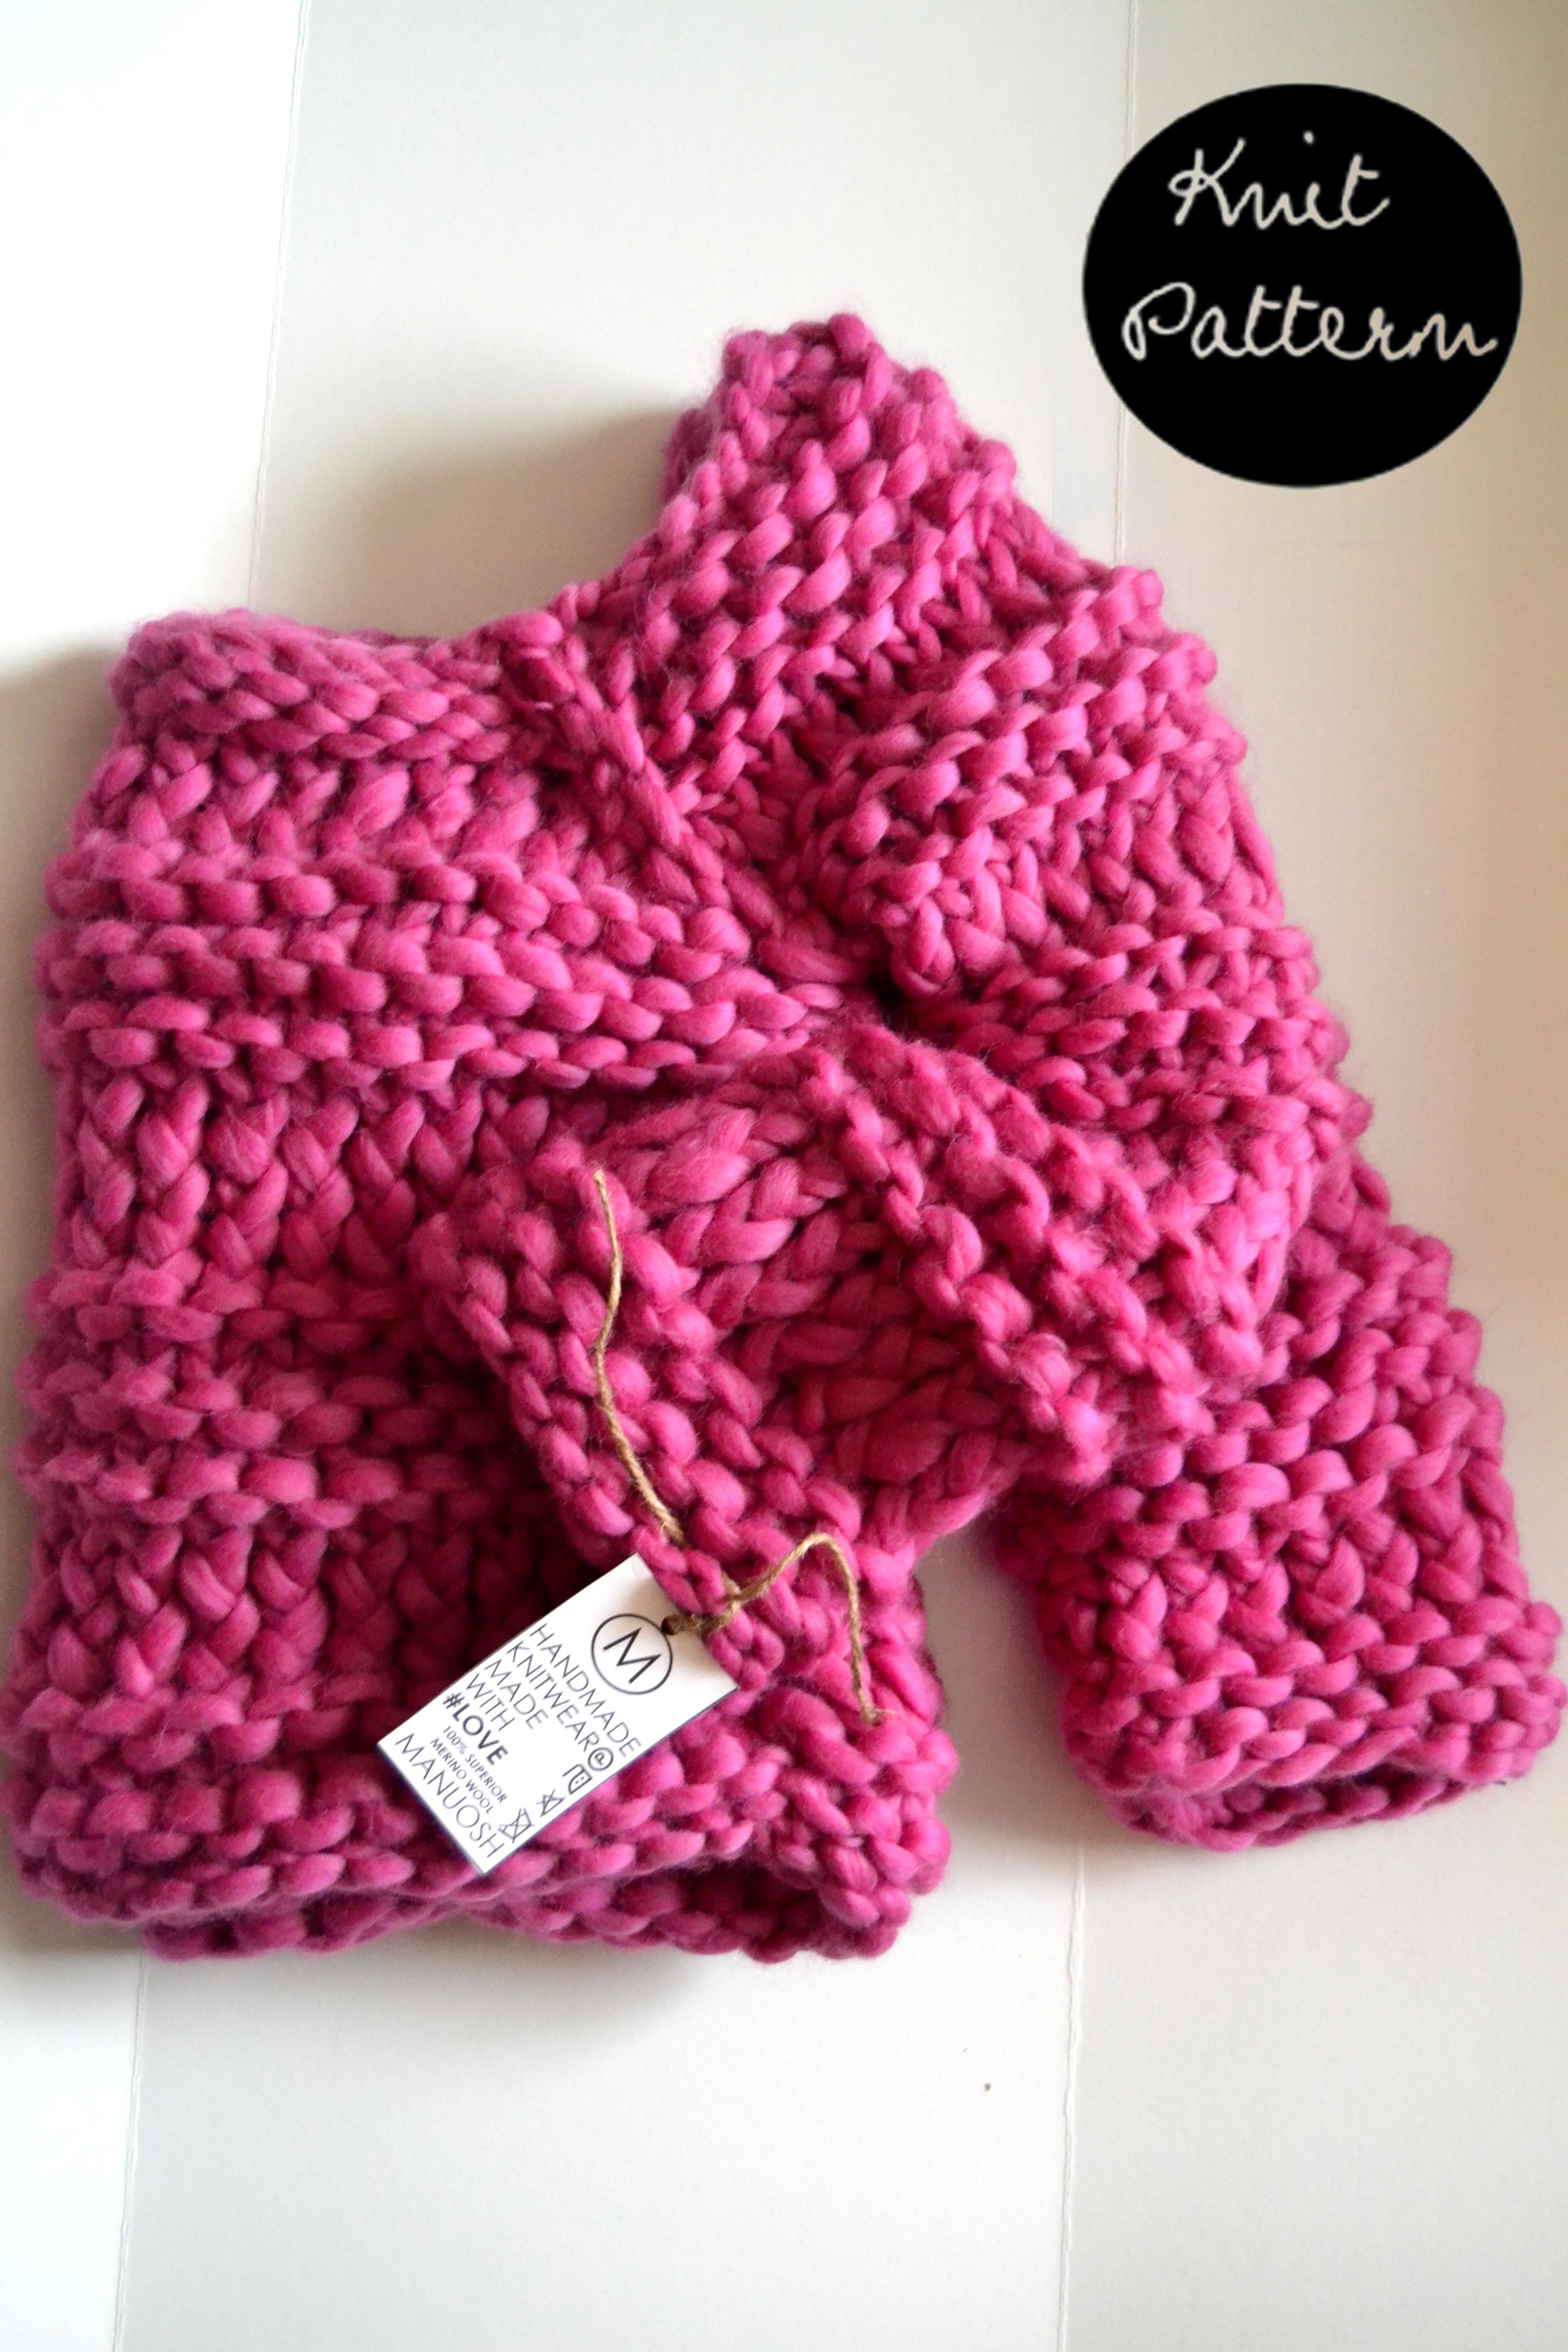 knitpatternposh